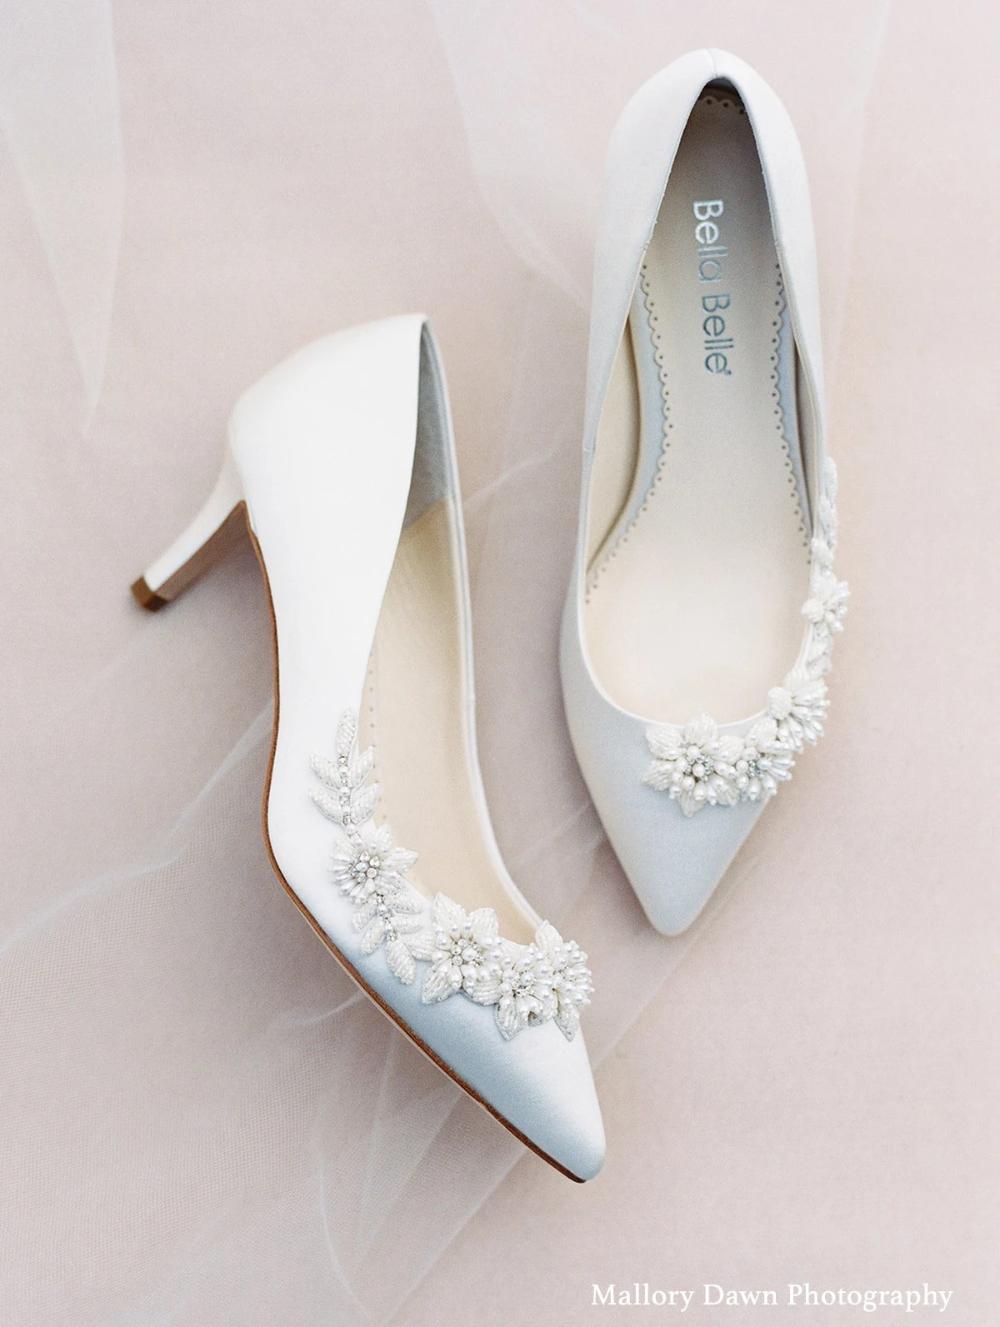 Floral And Beads Kitten Heel Wedding Shoe Ivory Kitten Heels Wedding Wedding Shoes Heels Kitten Heel Wedding Shoes